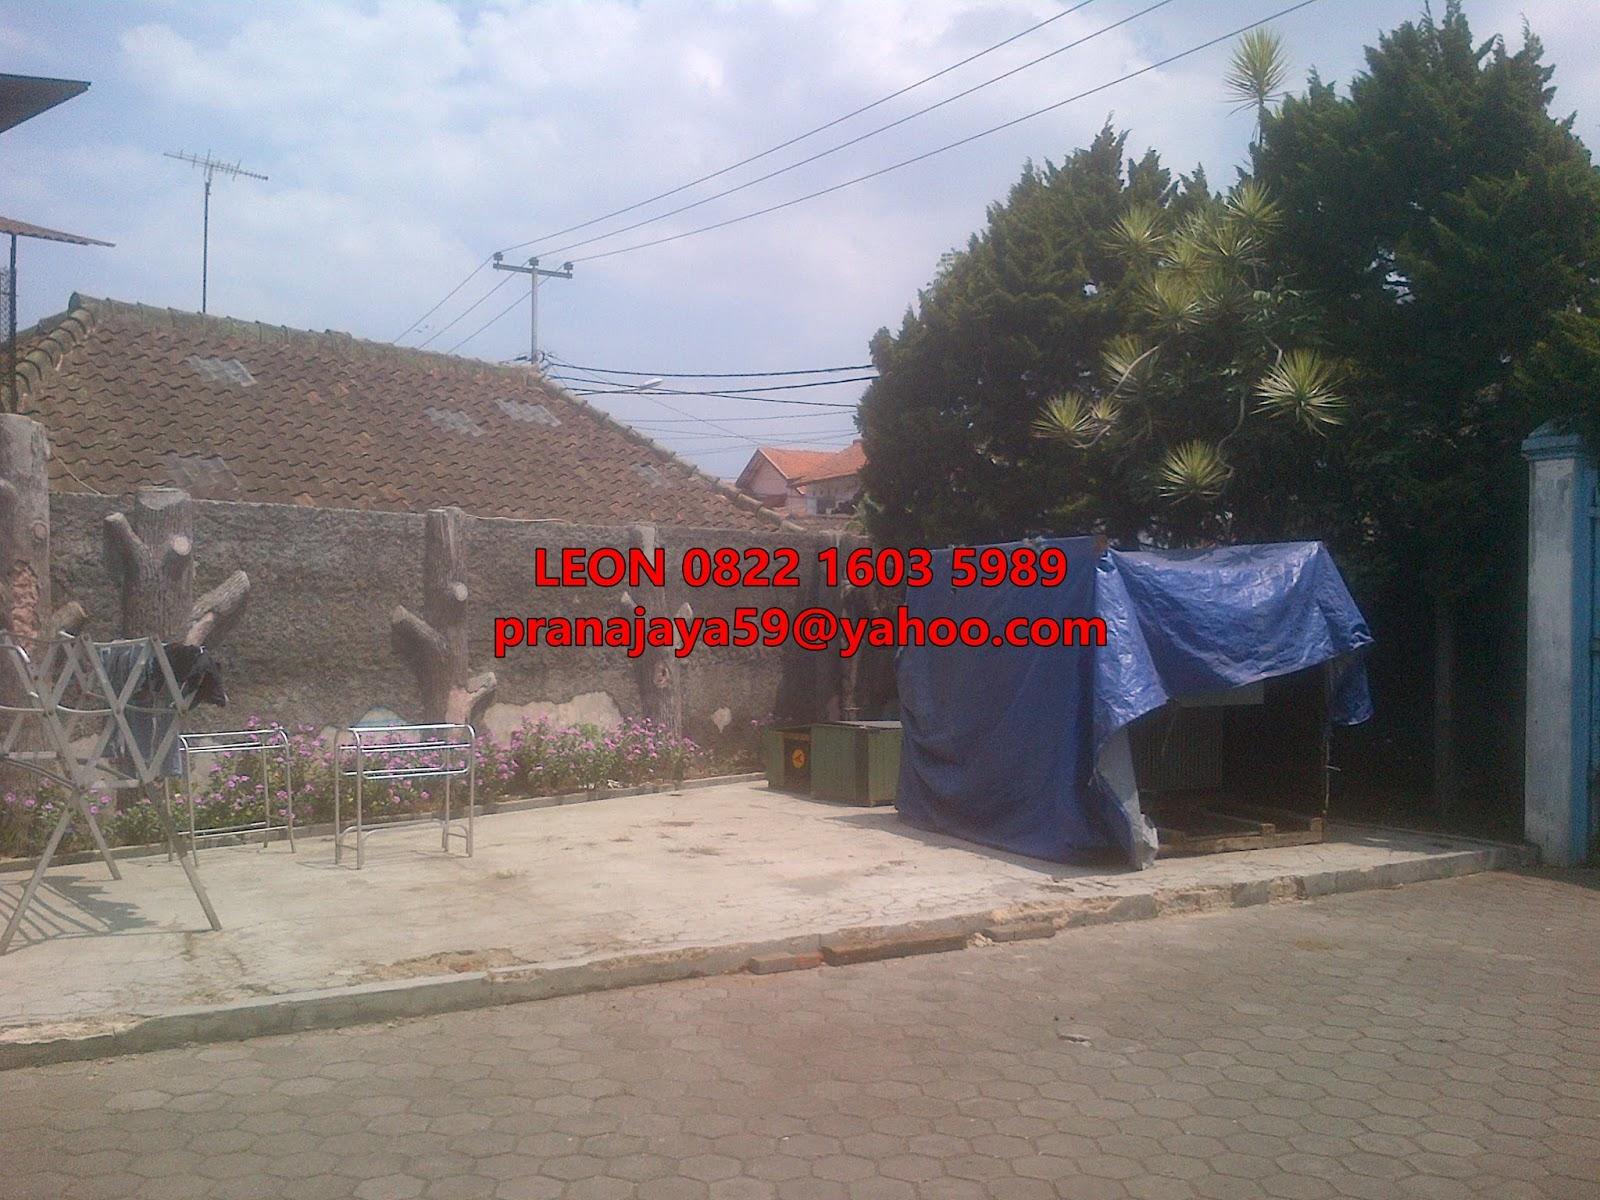 Jual Beli Rumah Bandung & Cimahi: Mainroad Alun-Alun Cimahi